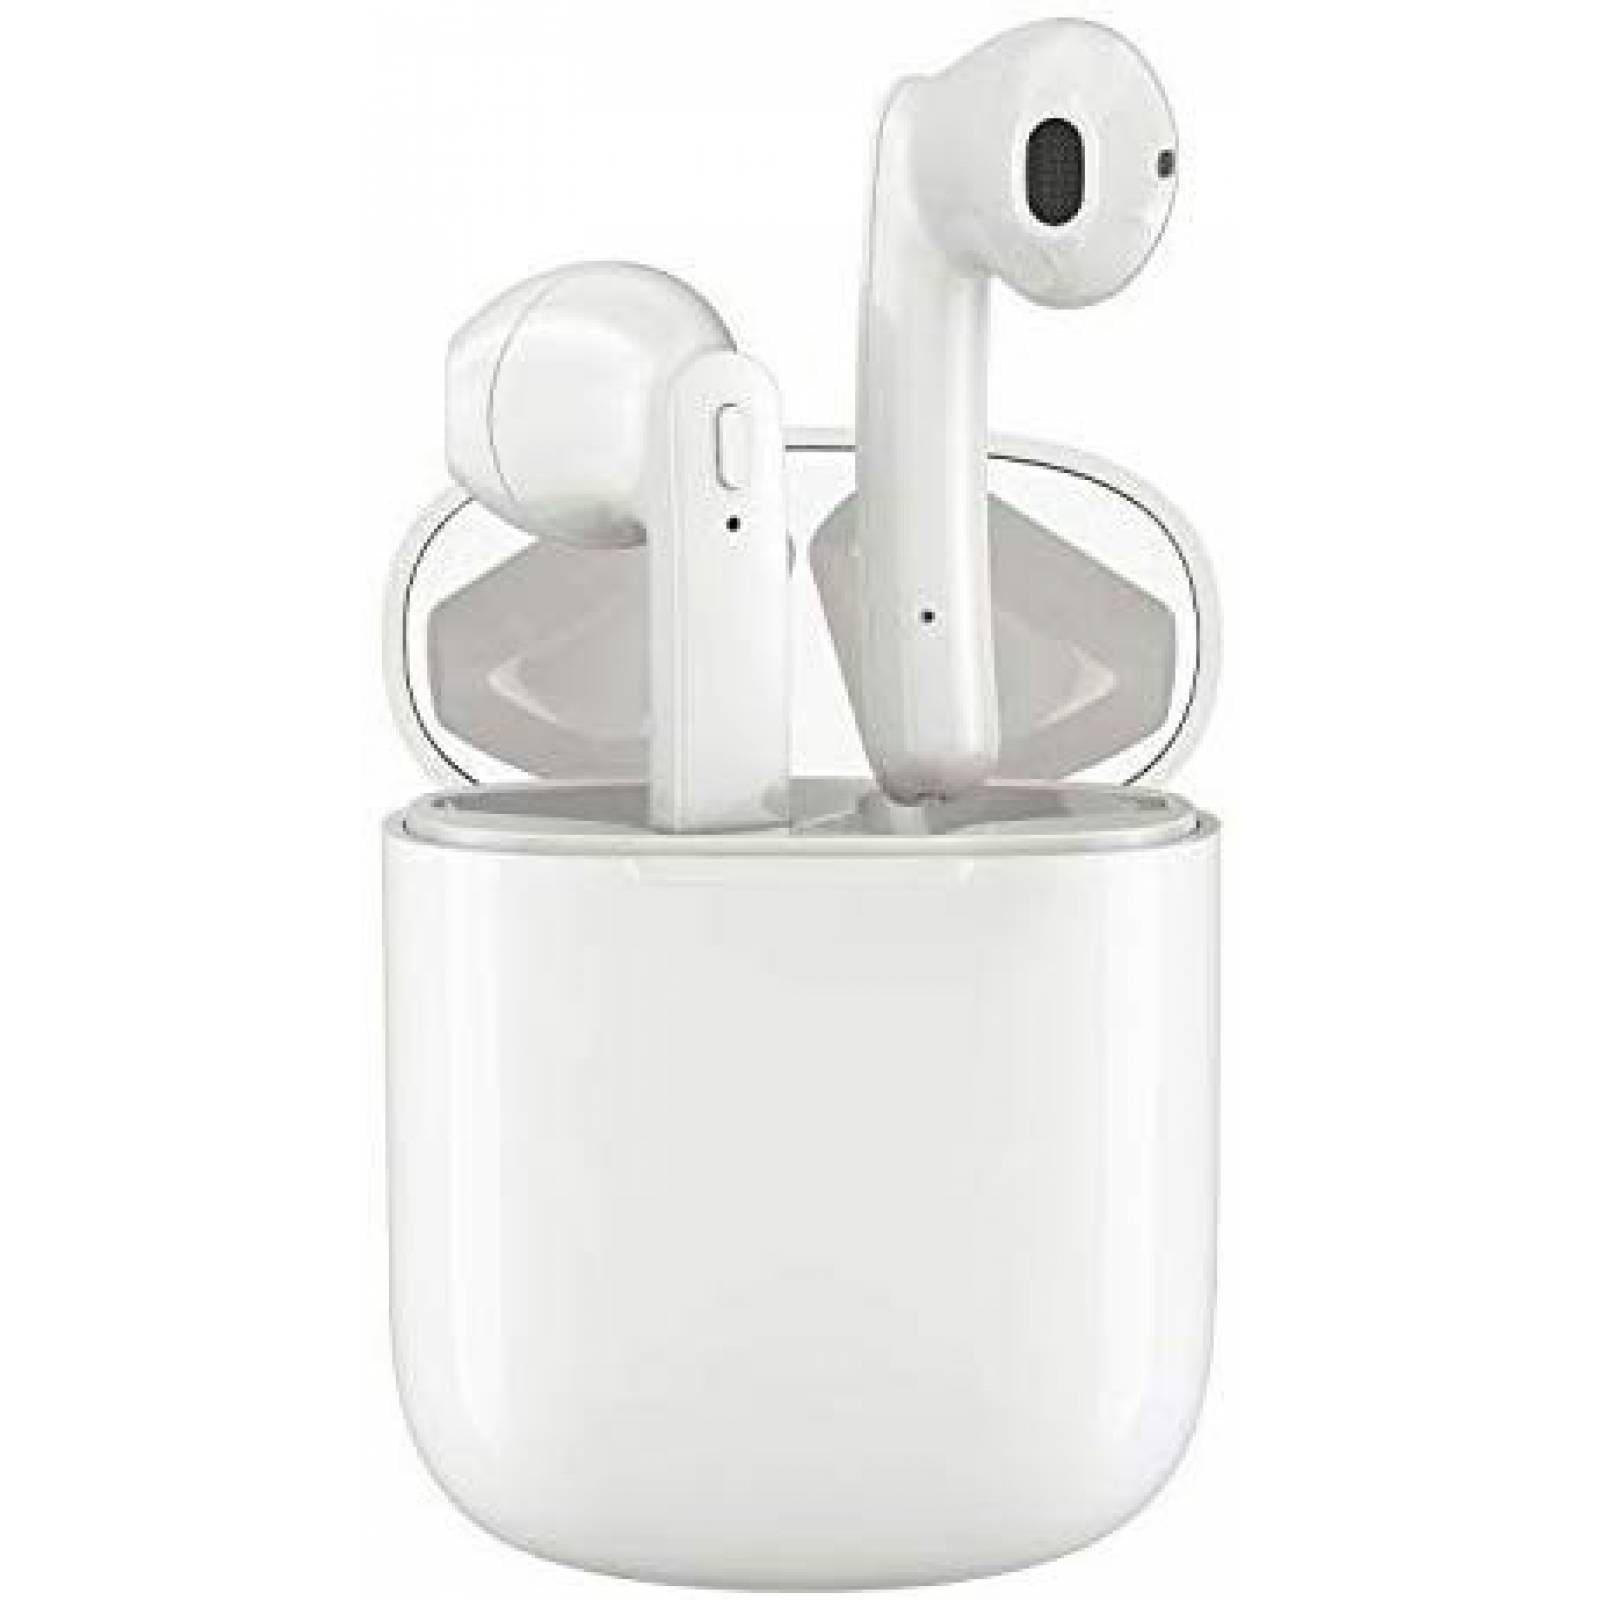 Audífonos Rademax T12 Bluetooth Cancelan Ruido IPX5 -Blanco